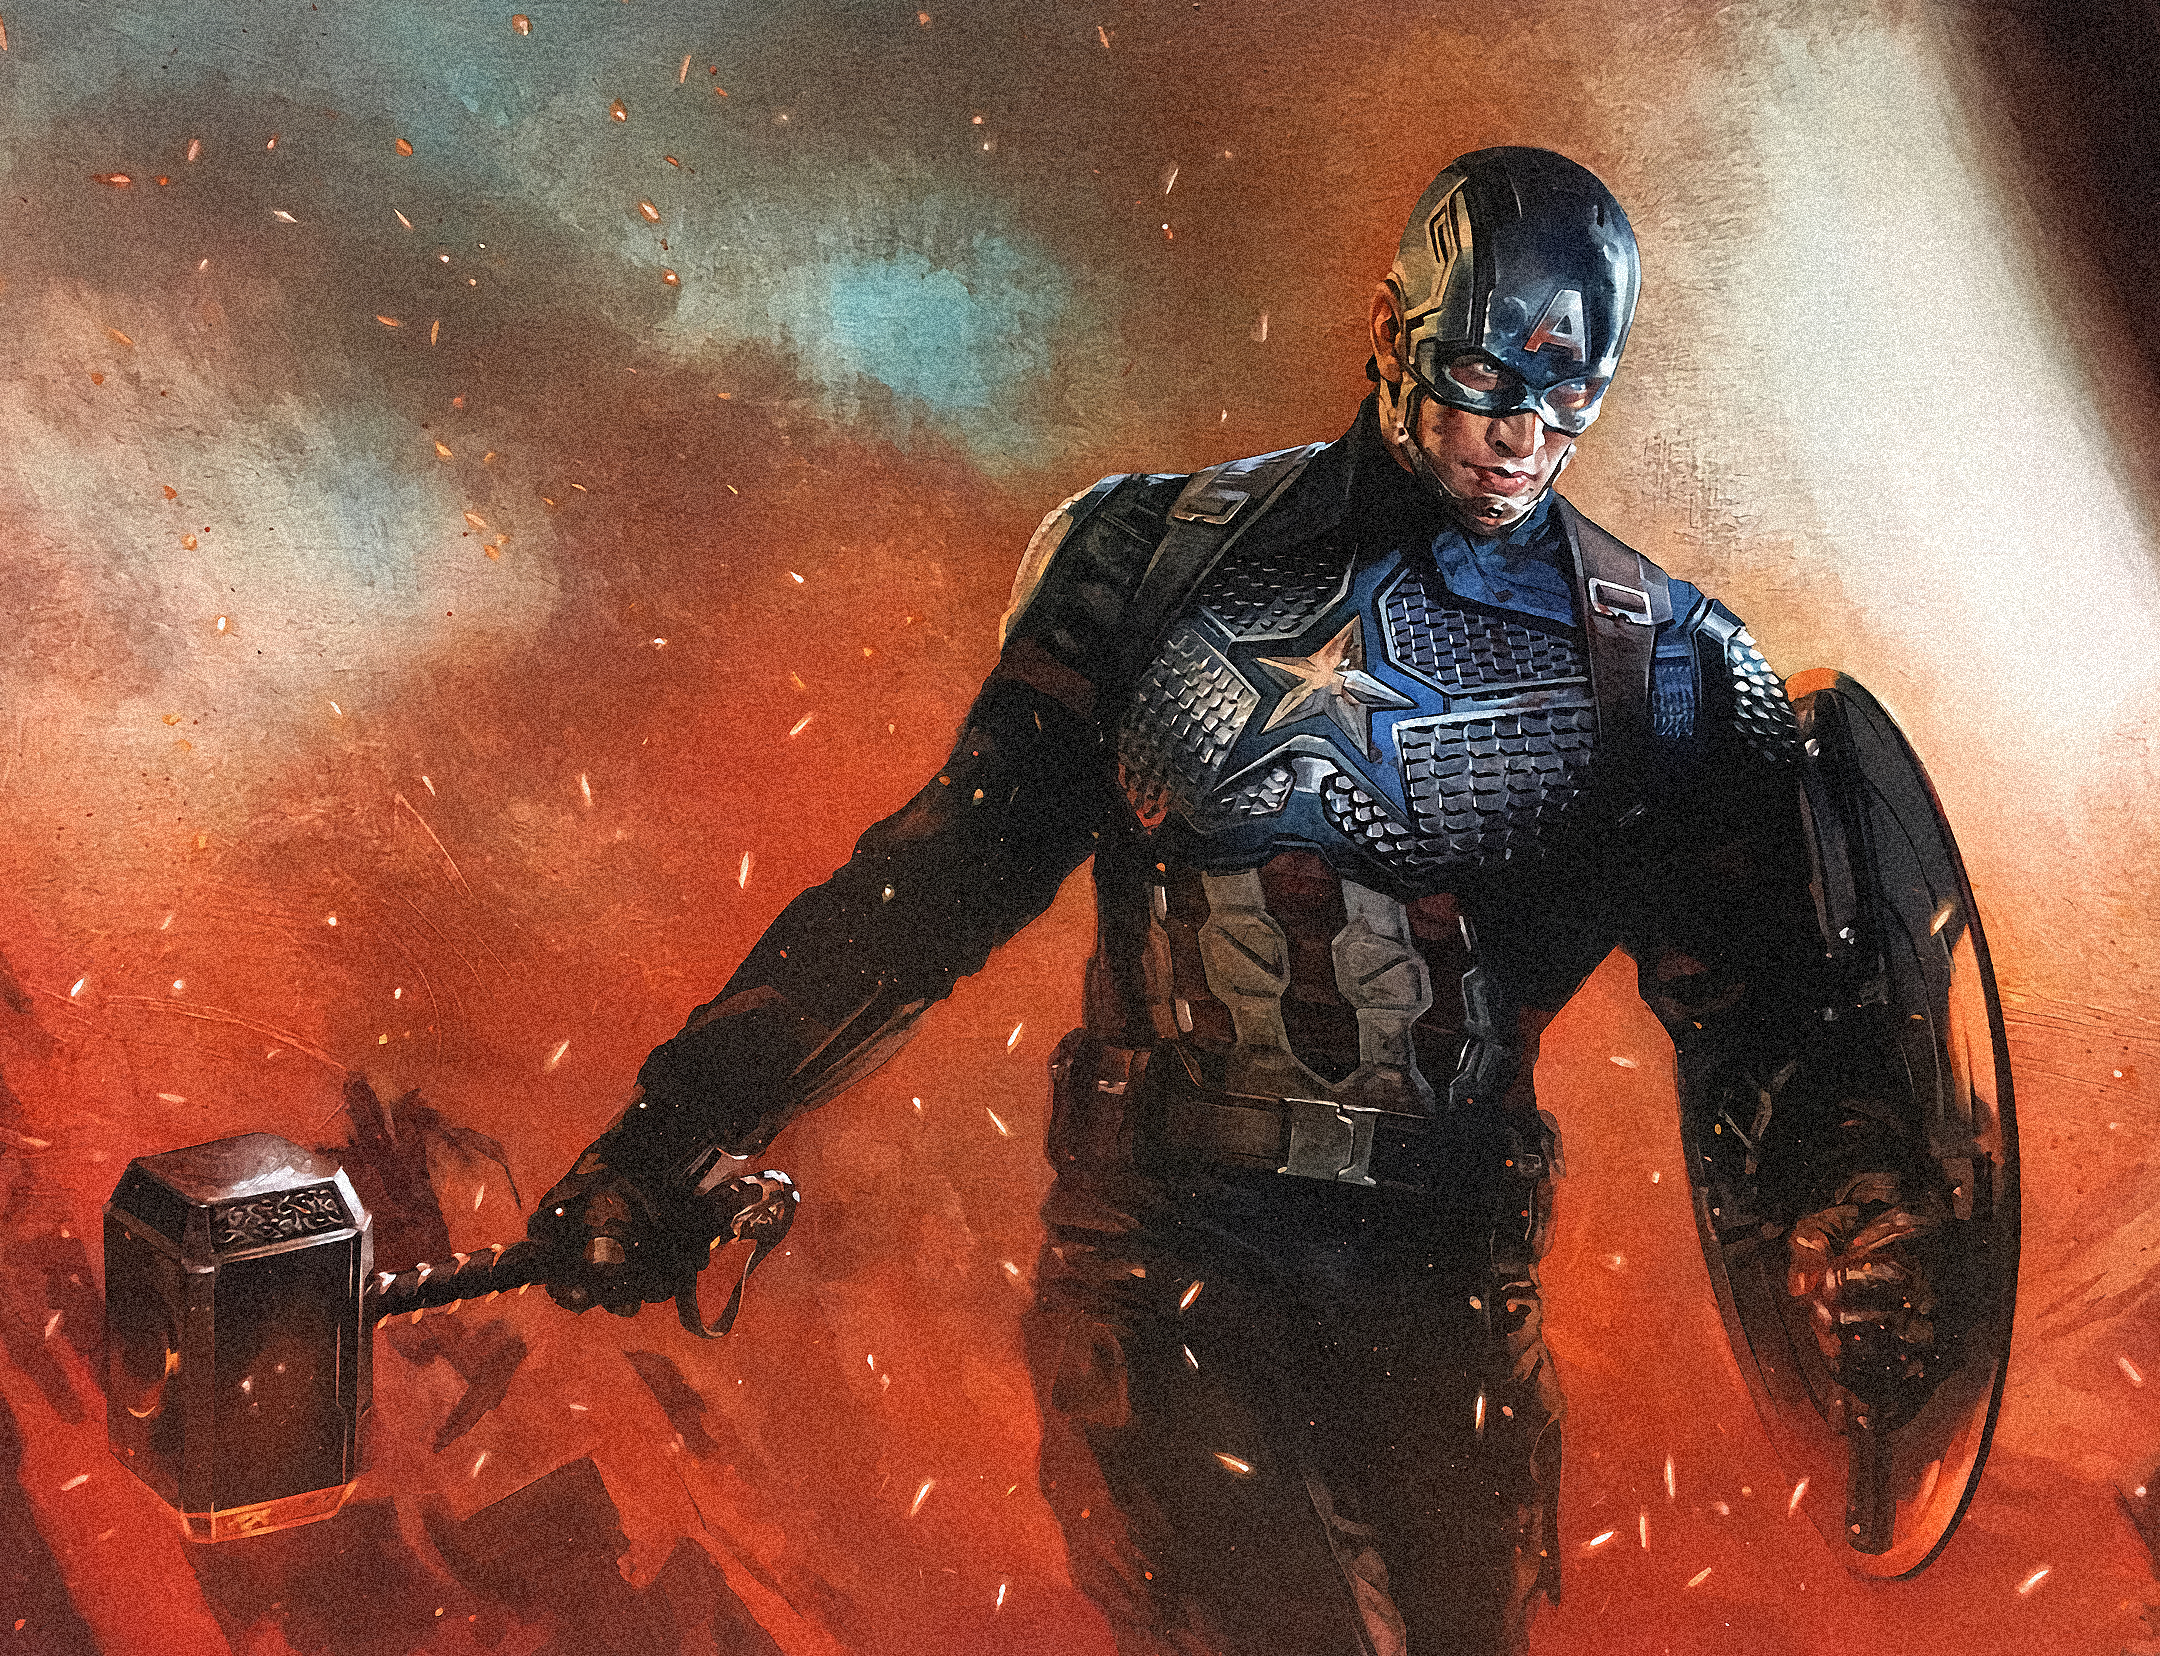 Captain America Mjolnir Hd Wallpaper Background Image